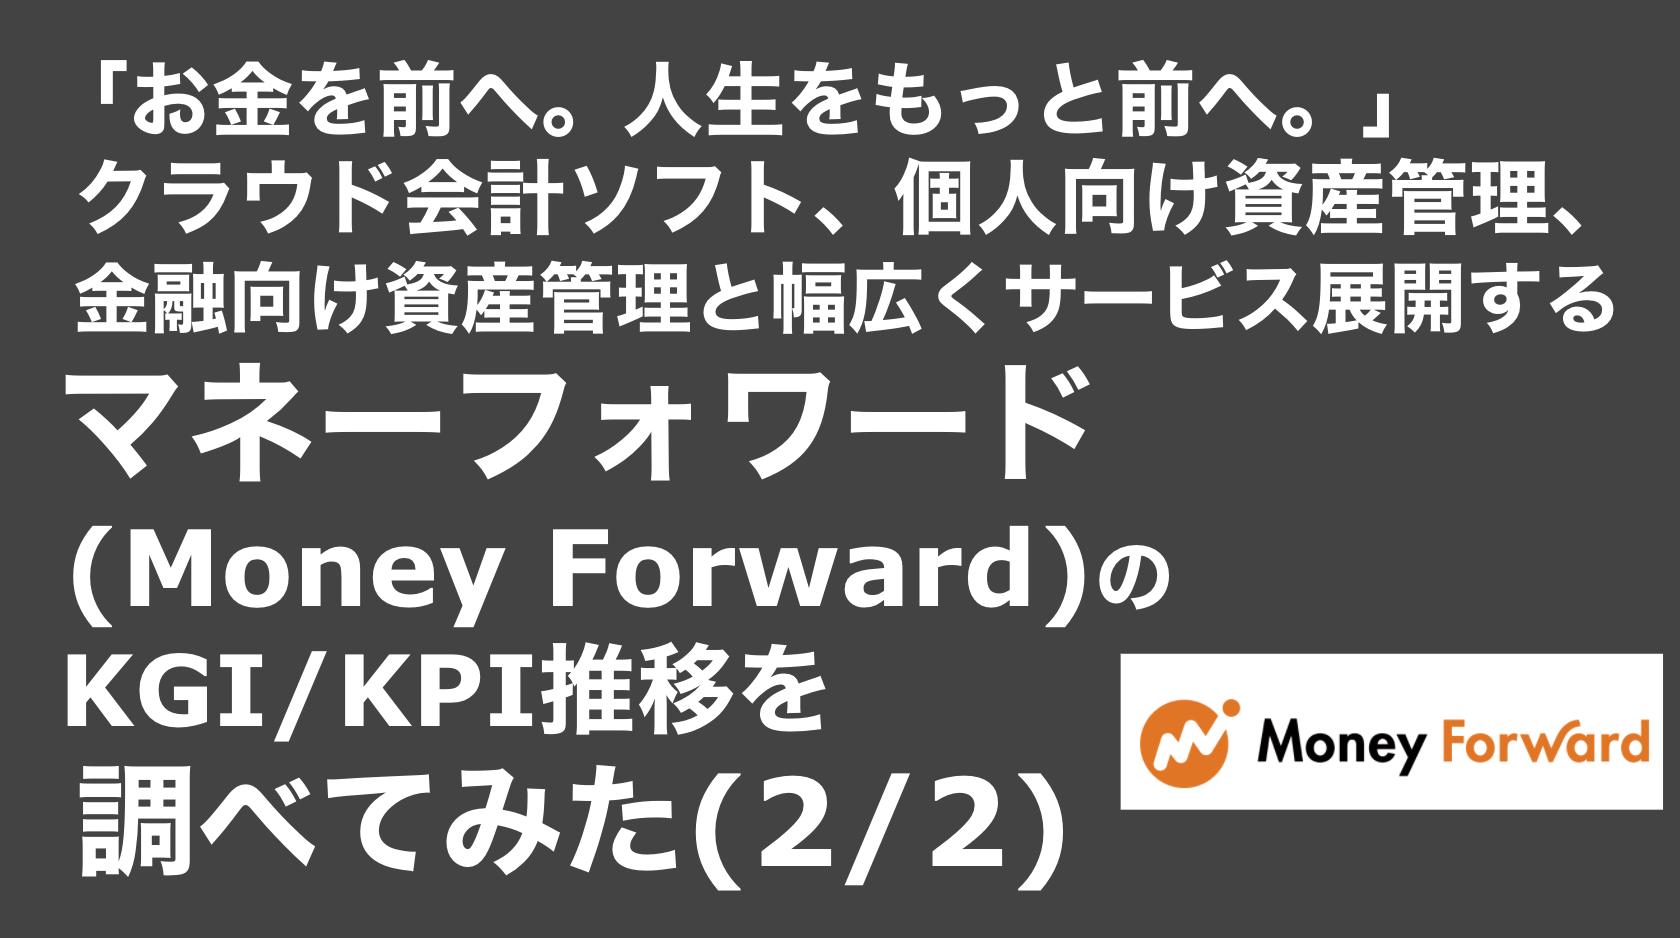 saaslife_「お金を前へ。人生をもっと前へ。」クラウド会計ソフト、個人向け資産管理、金融向け資産管理と幅広くサービス展開するマネーフォワード(Money Forward)のKGI/KPI推移を調べてみた(2/2)